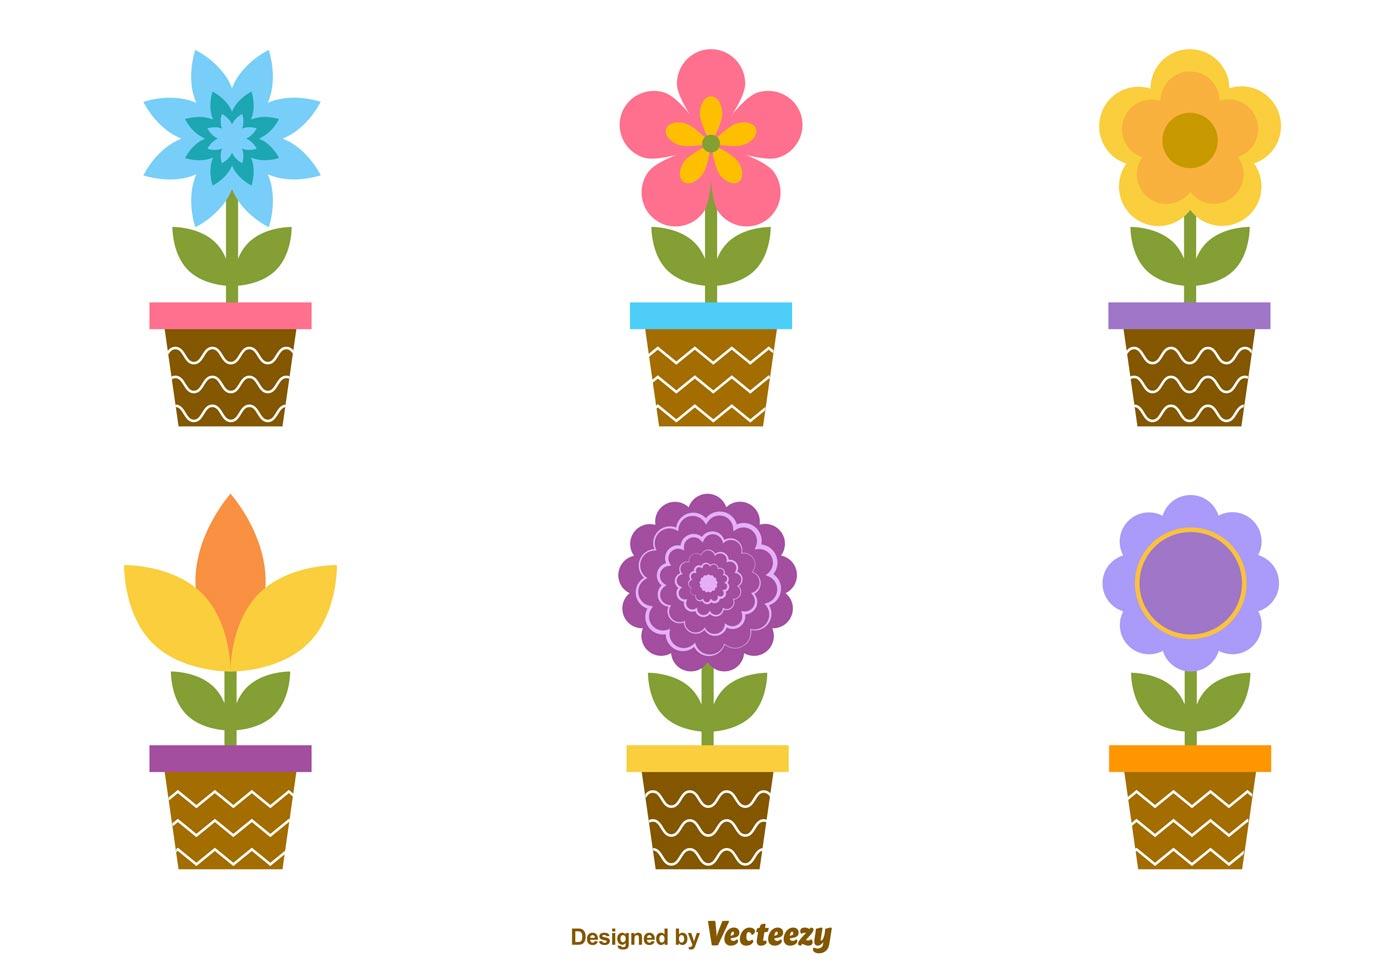 Potes De Flores De Desenho Animado Download Vetores Gratis